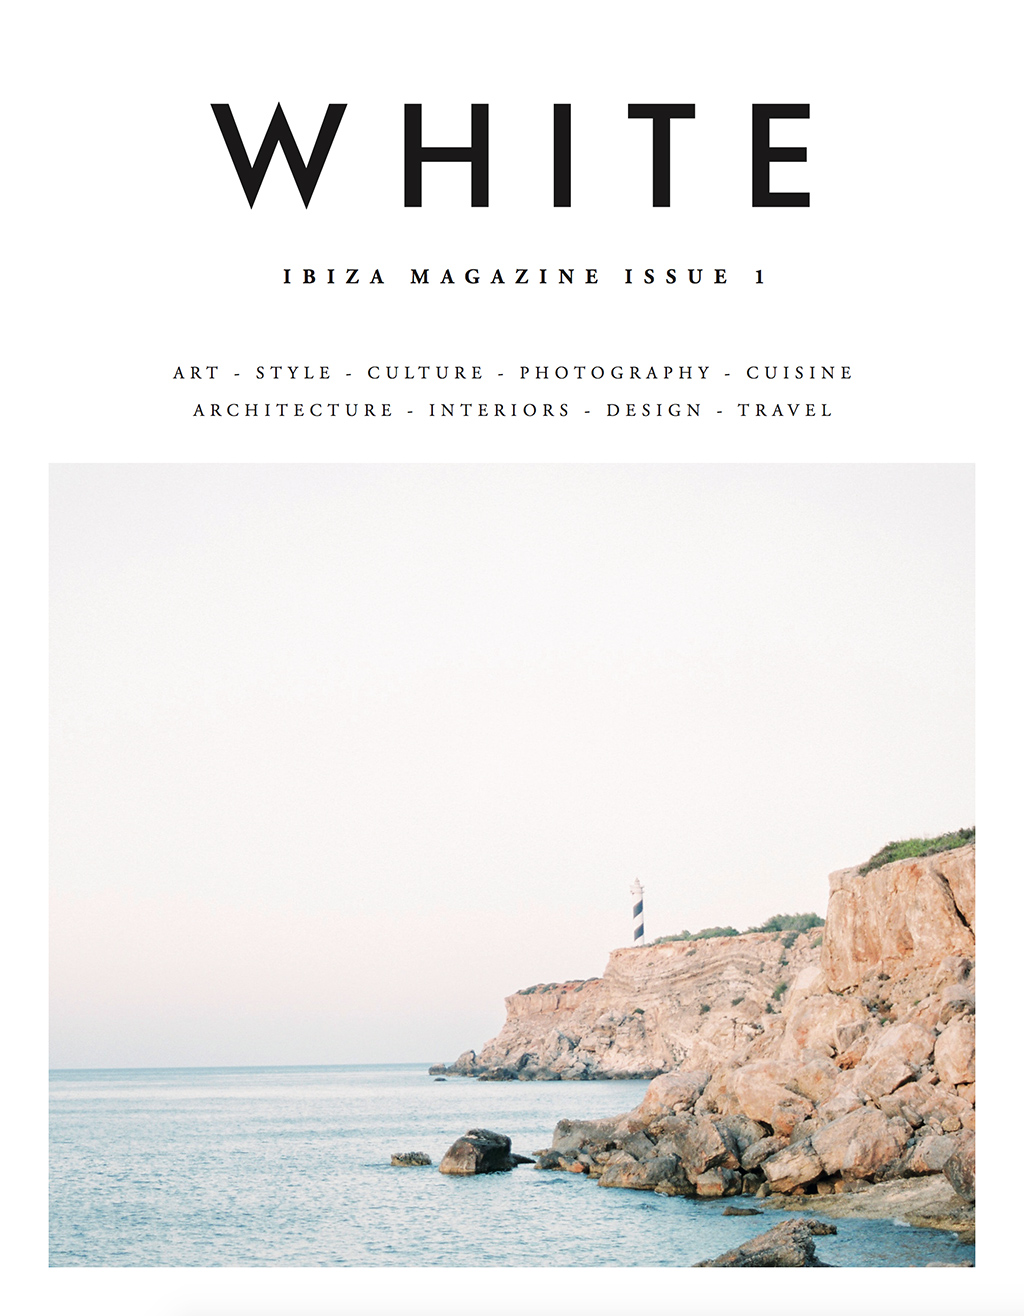 white-ibiza-magazine-issue-1-cover-3.jpg